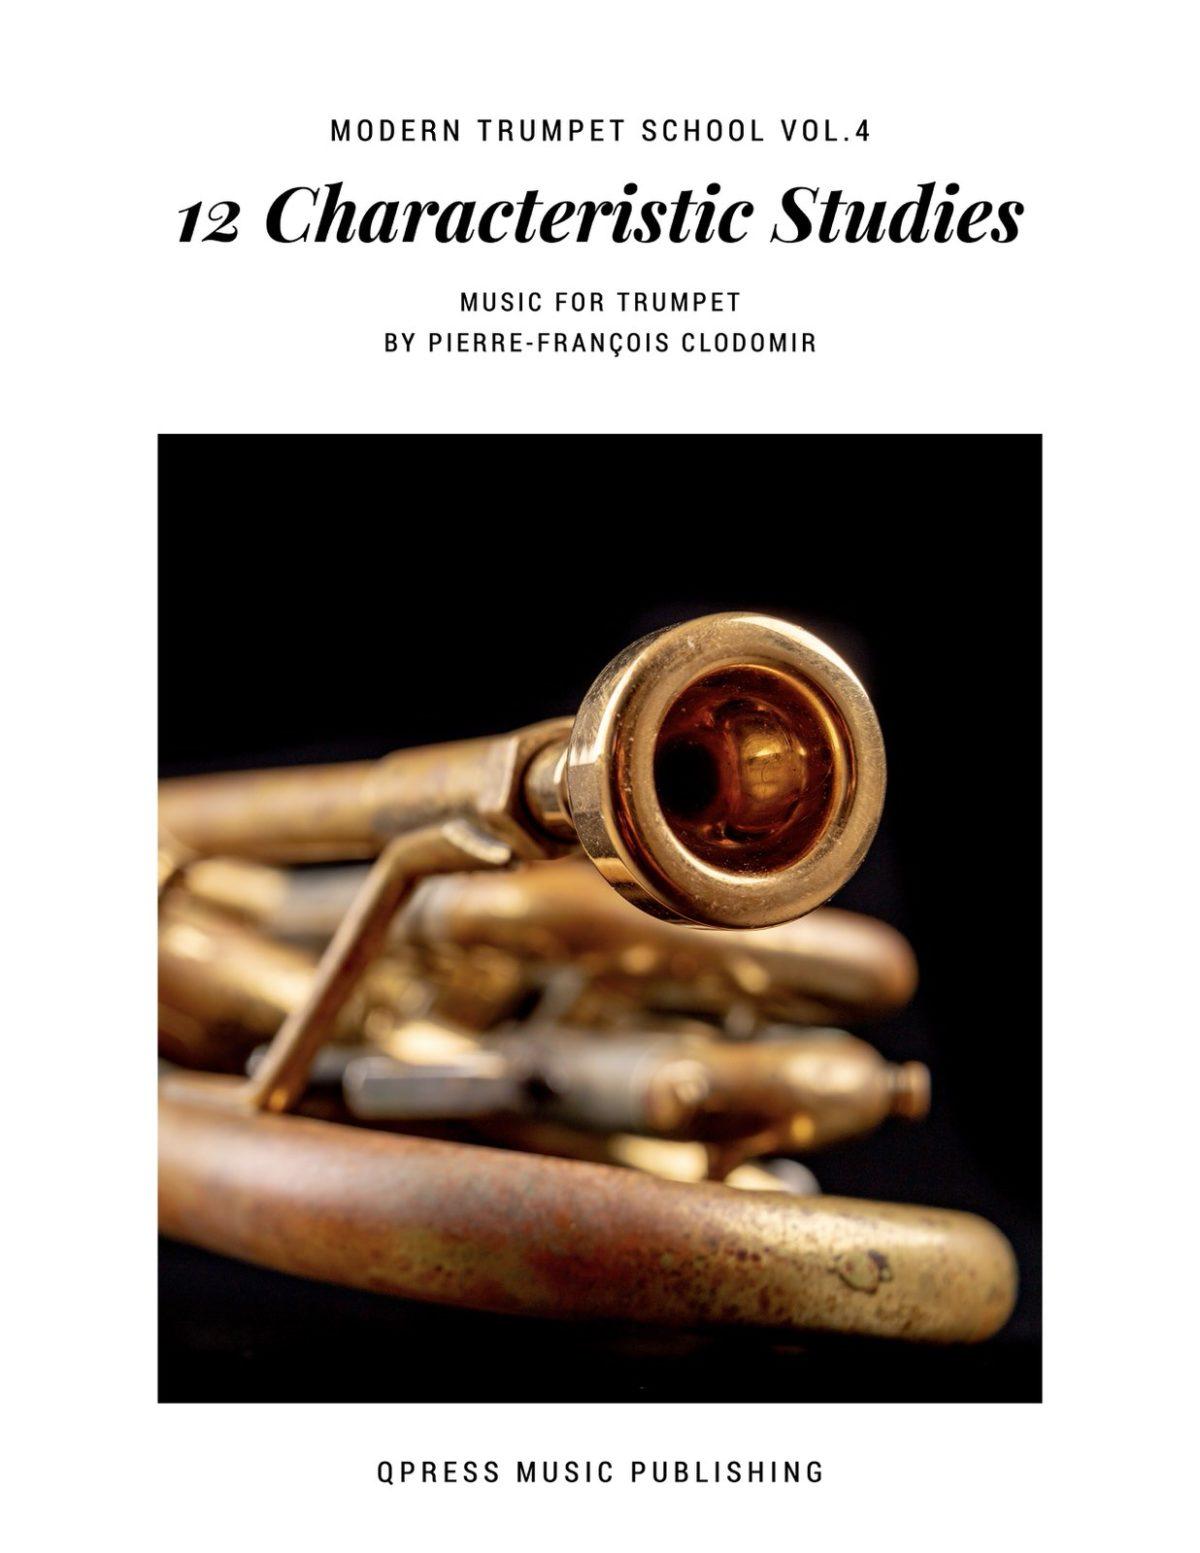 Clodomir, Modern Trumpet School 4, 12 Charateristic Studies-p01